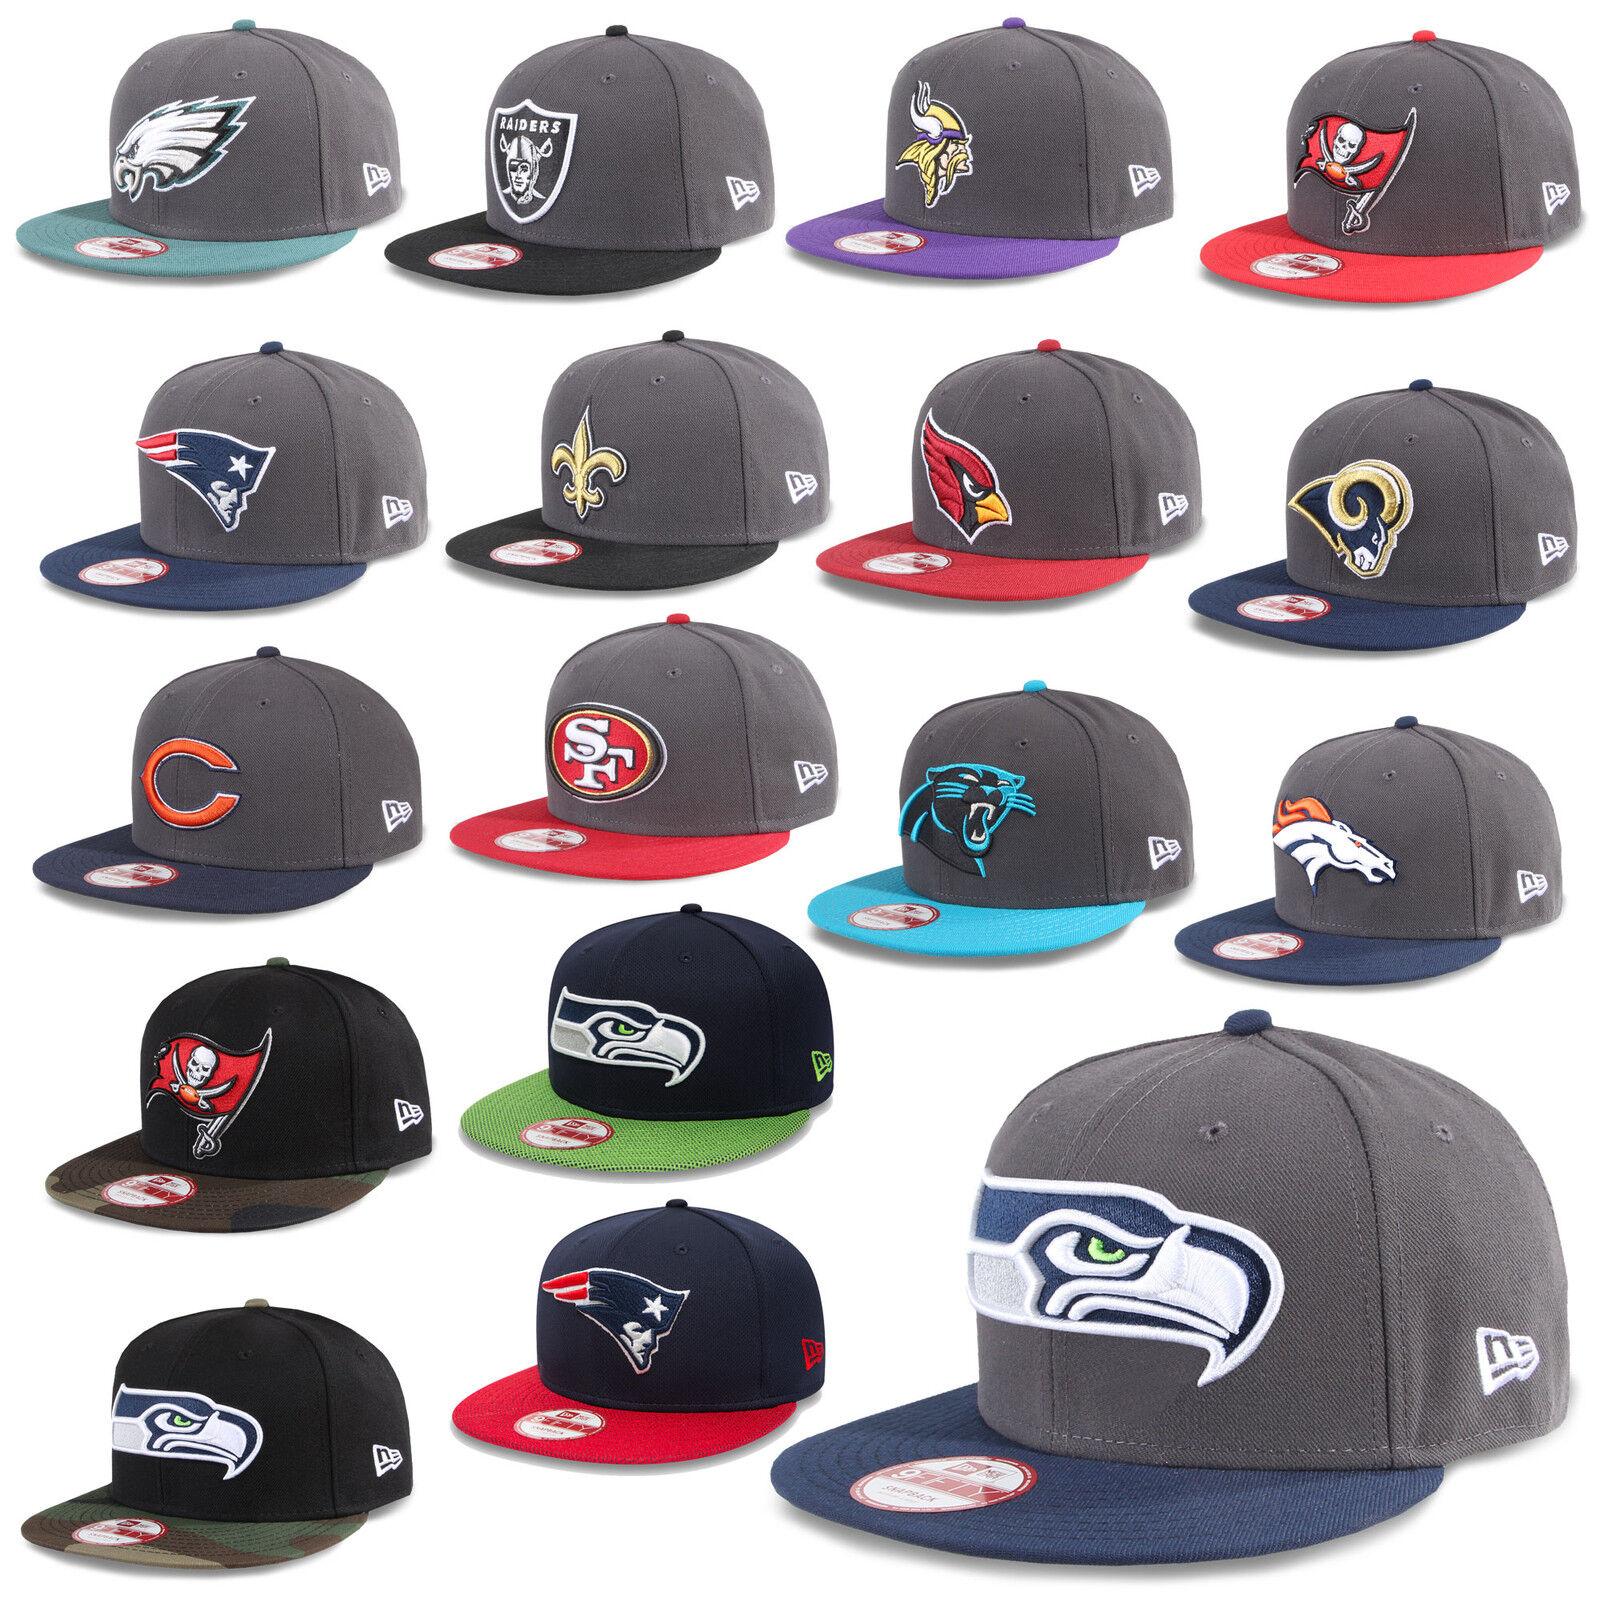 urbandreamz ltd https   stores.eBay.de urbandreamz ltd  bfa314  urbandreamz ltd 1. New era Snapback Cap 950 NFL ... 8cb427c69676